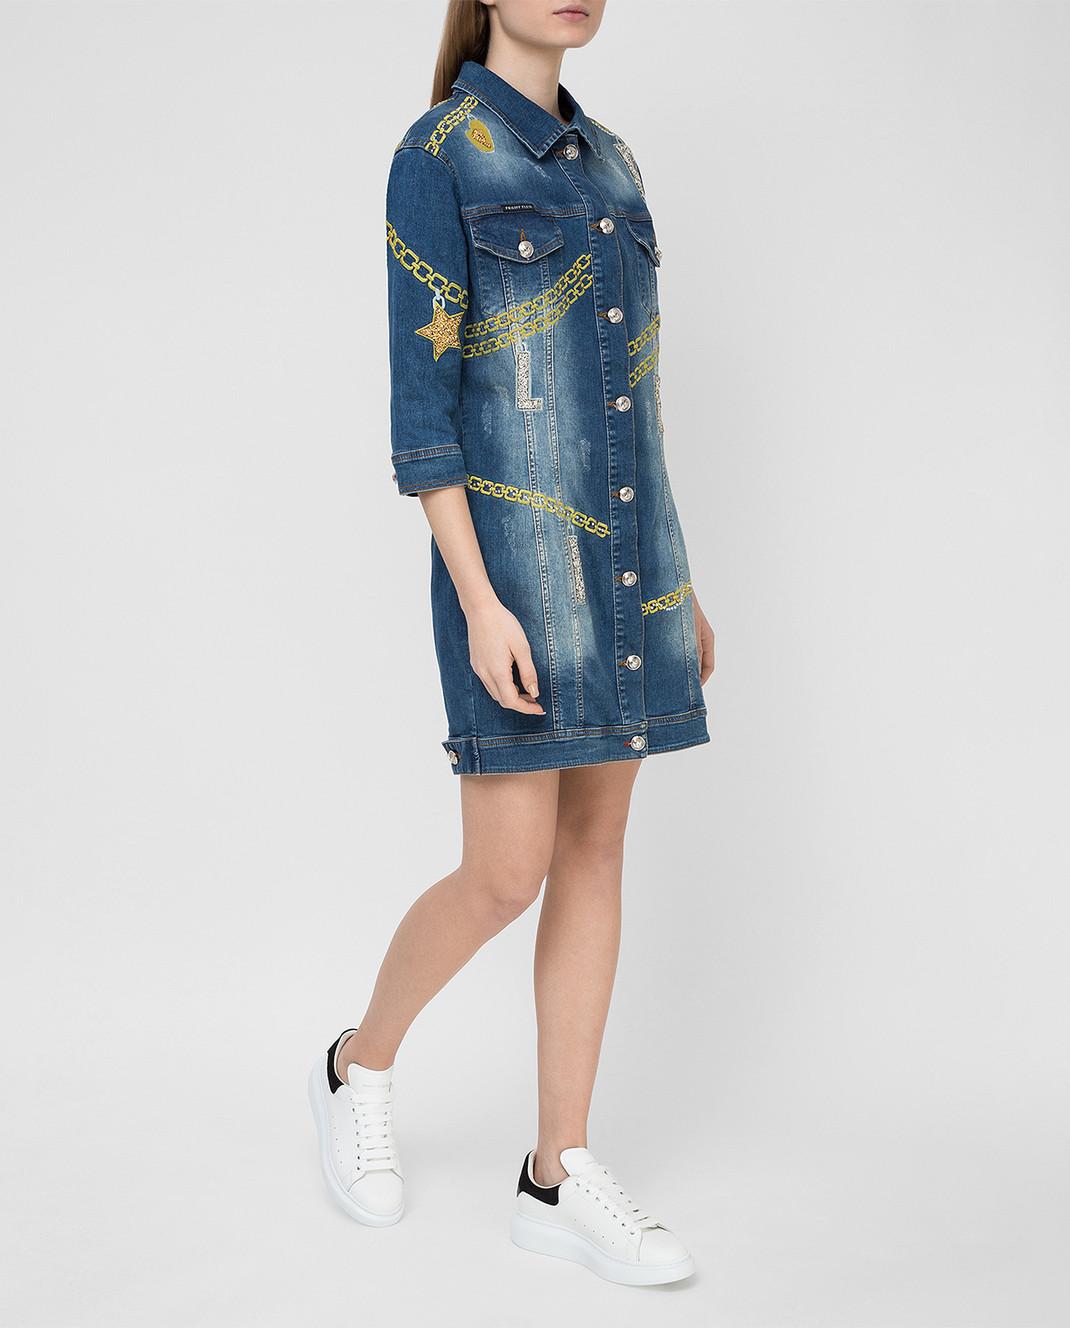 Philipp Plein Синее платье CWDG0016 изображение 2